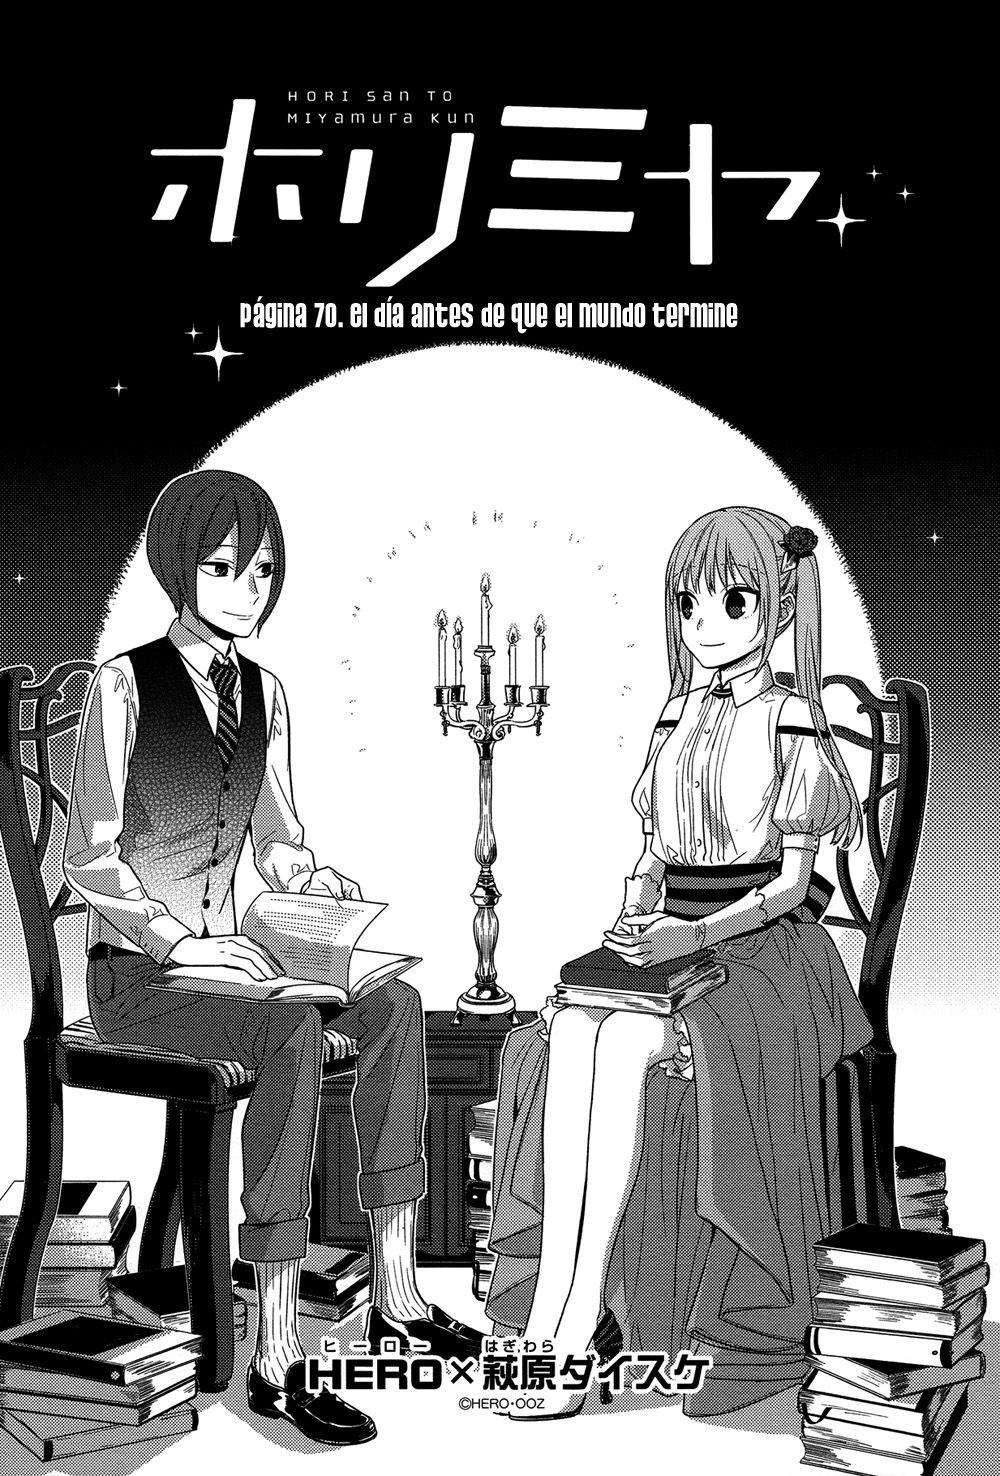 http://c5.ninemanga.com/es_manga/pic2/19/1043/510345/3811a9de909221112268555204a5b90a.jpg Page 3